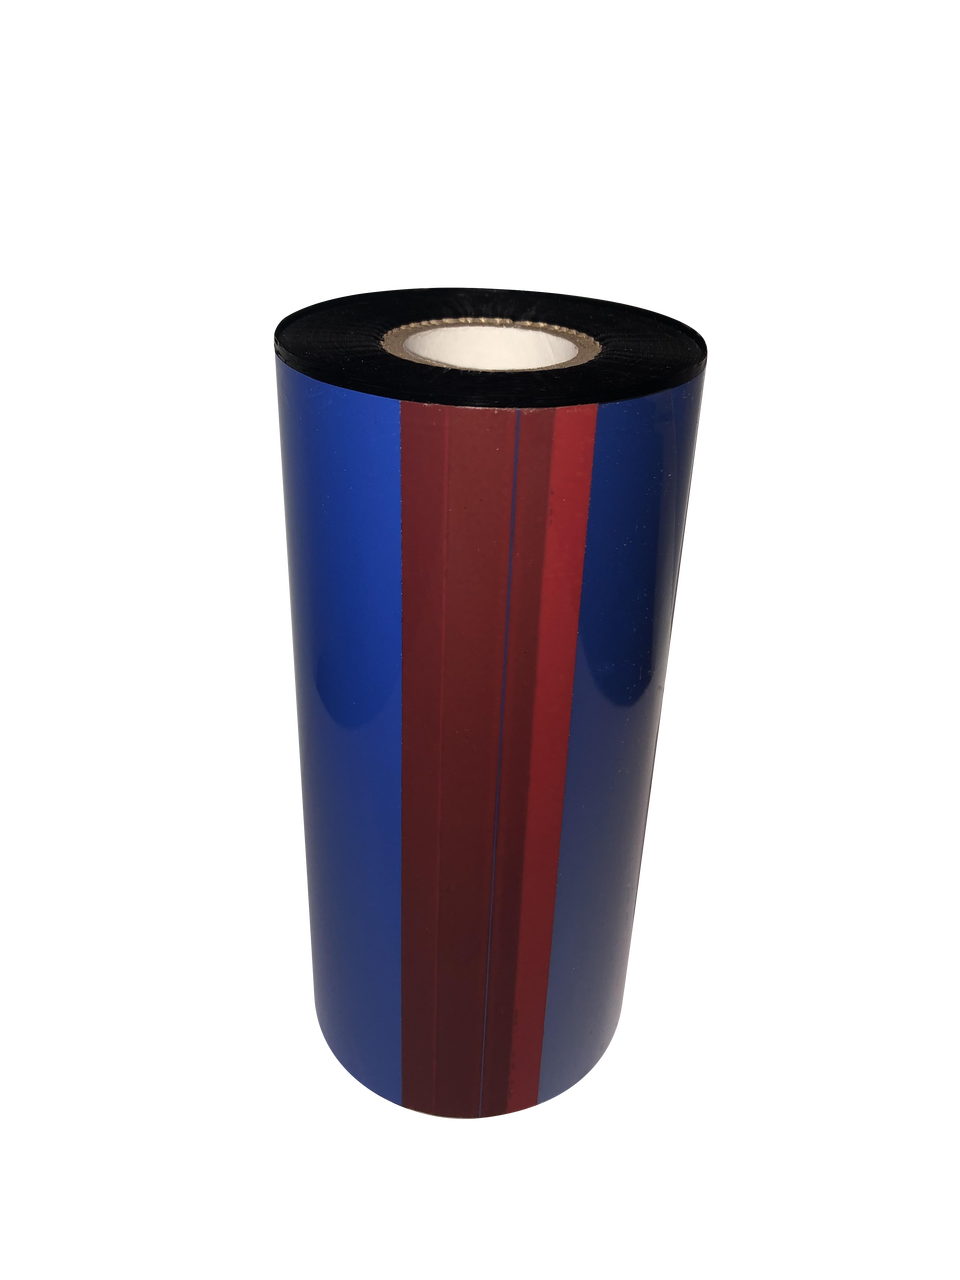 "DOMINO V320i 2.16""x4593 ft R396 High Speed Durable Near Edge Resin-12/Ctn thermal transfer ribbon"